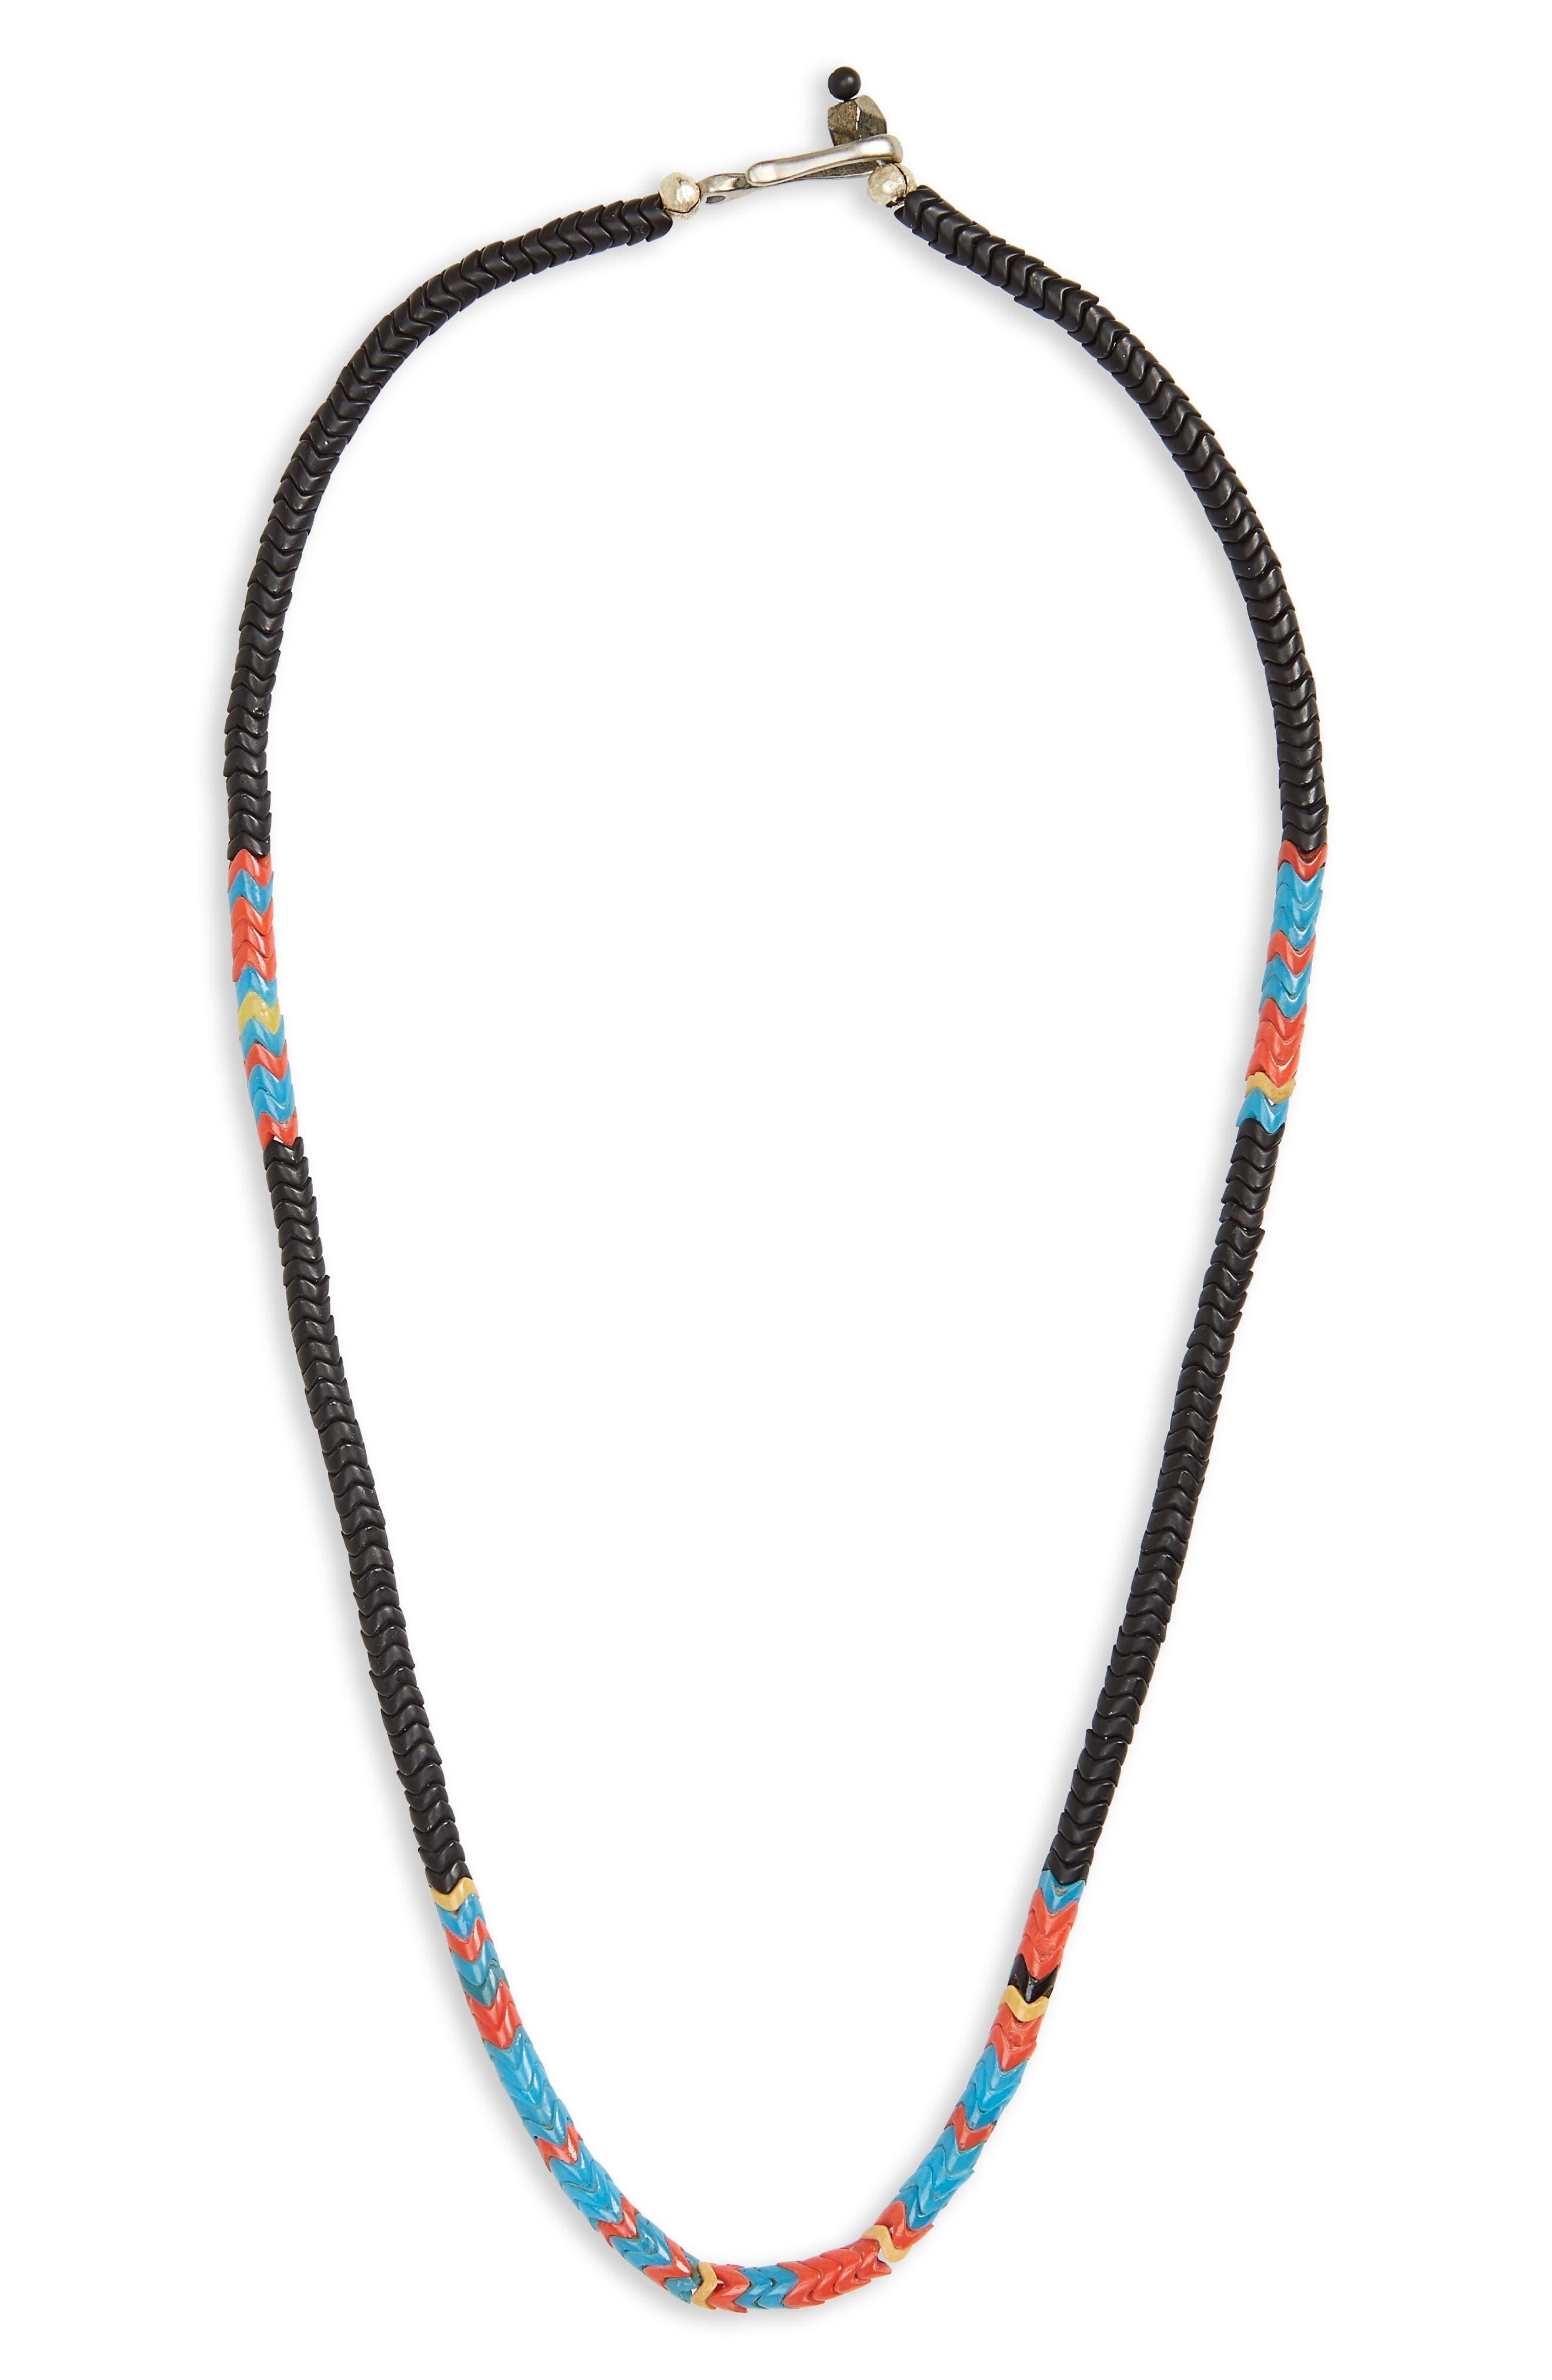 Stone Bead Necklace,                             Main thumbnail 1, color,                             BLUE/ BLACK